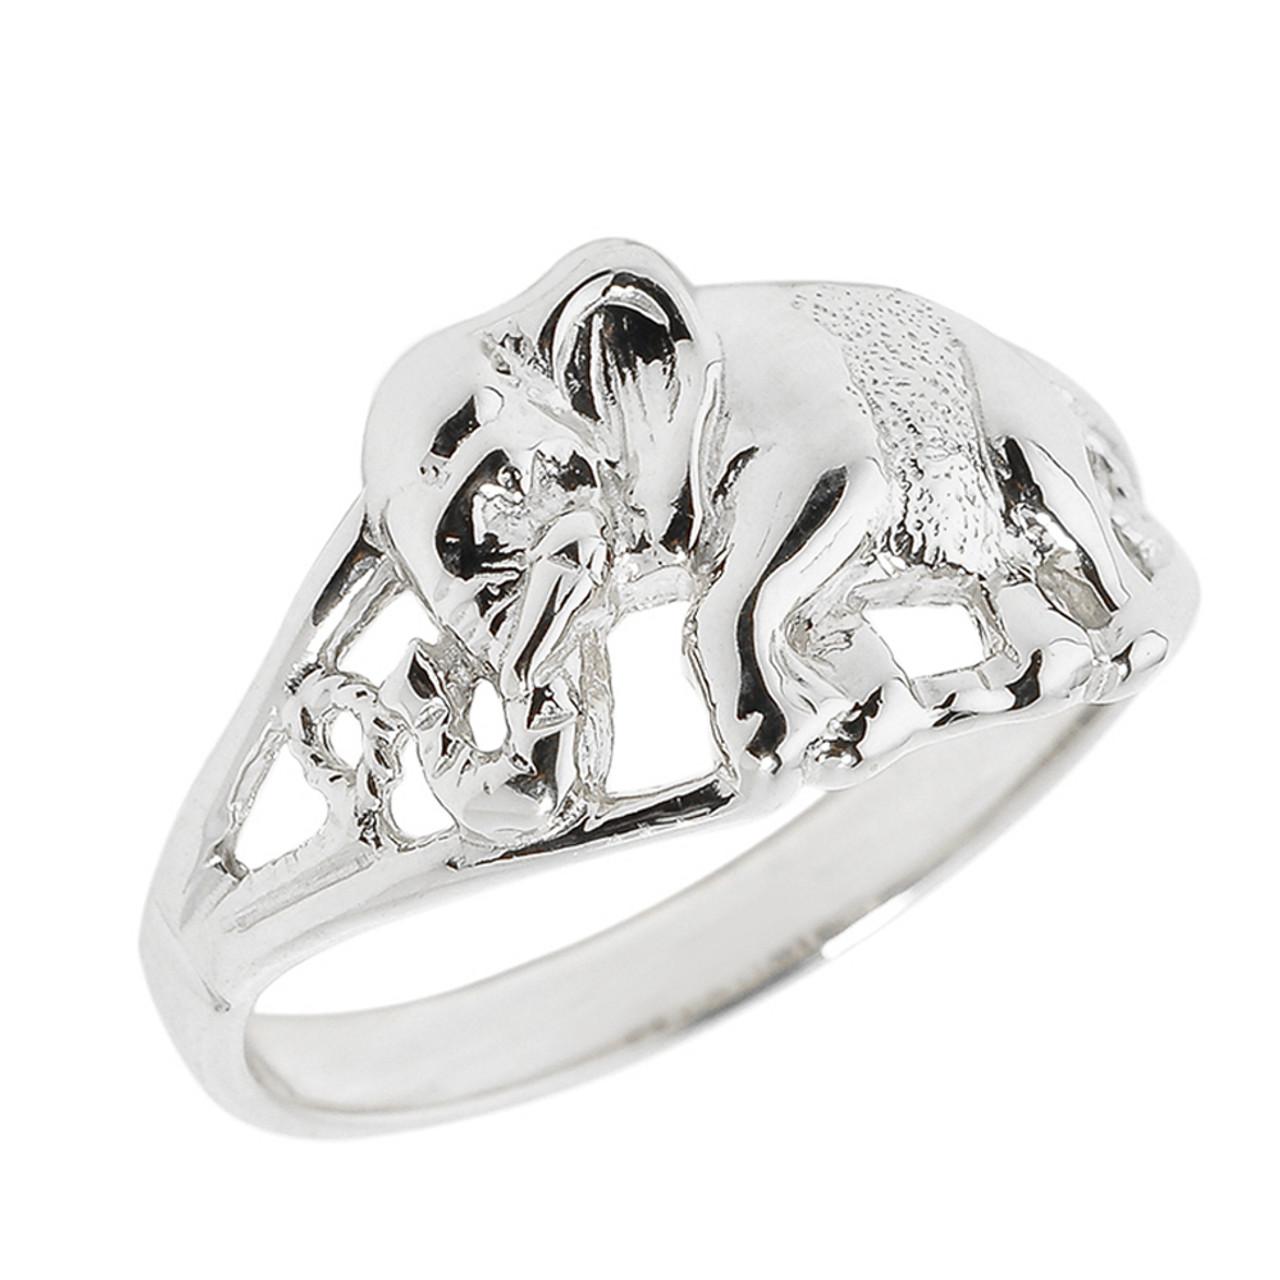 White Gold Openwork Elephant Ring